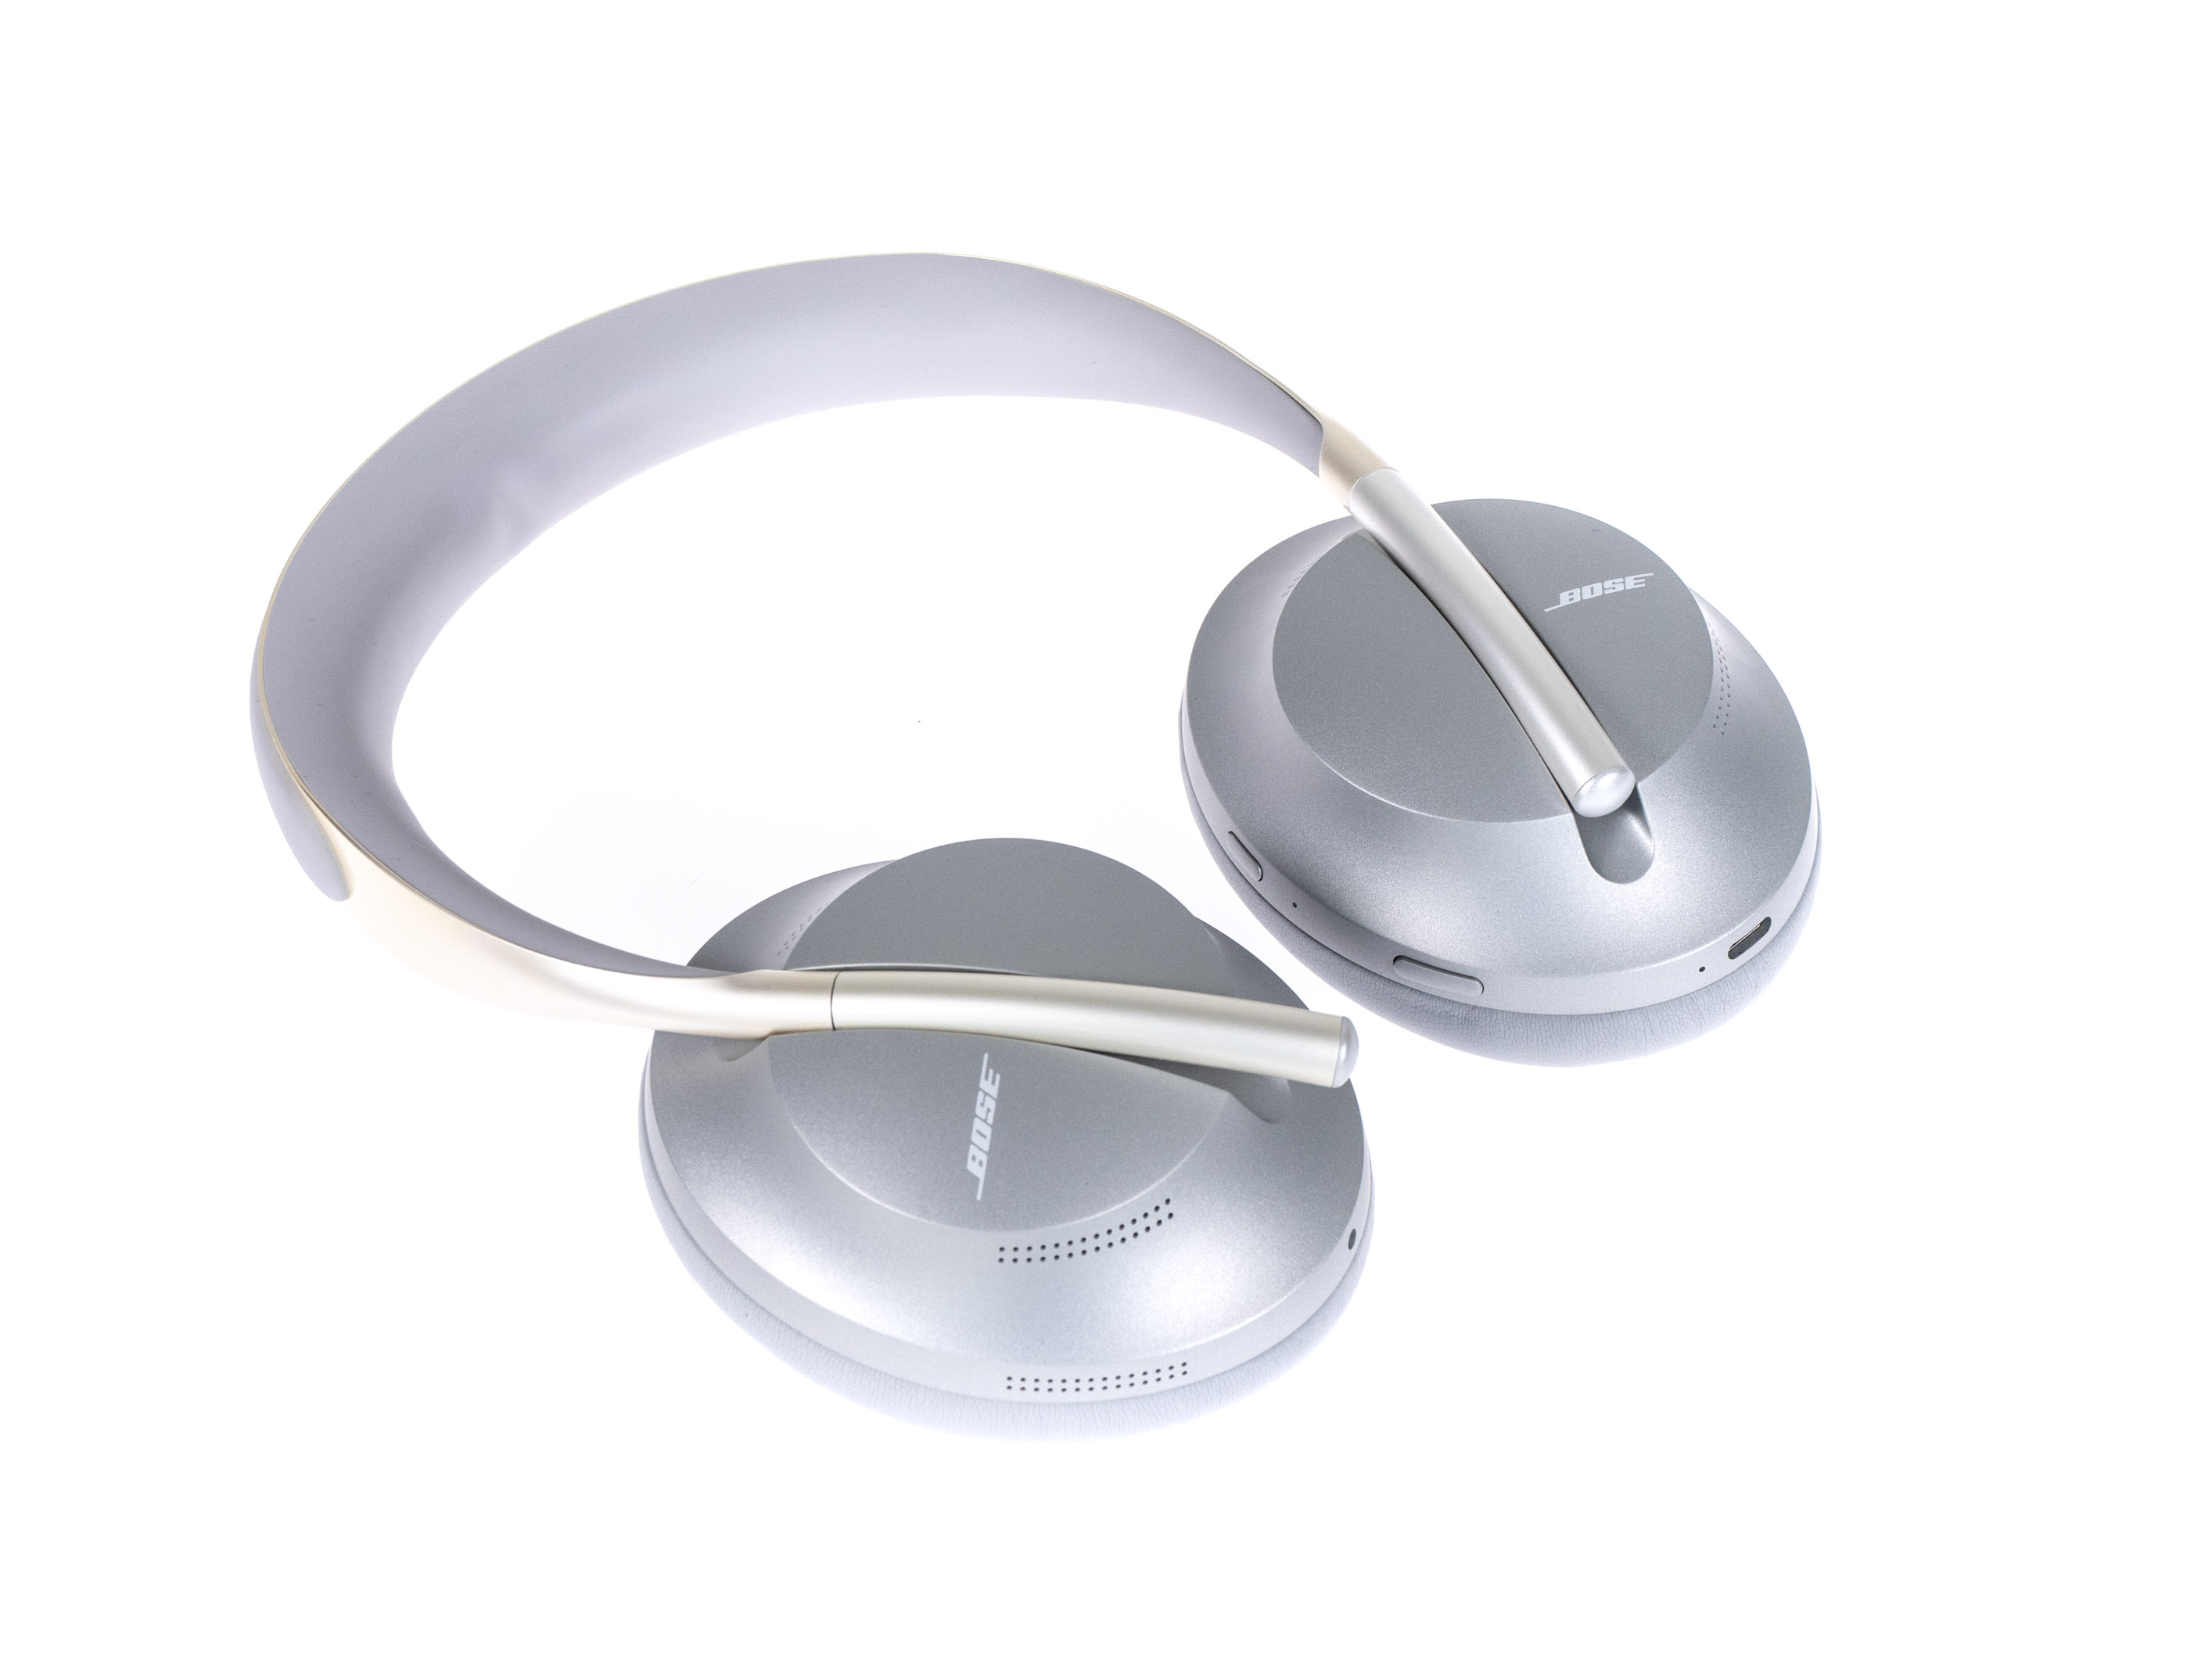 Noise Cancelling Headphones 700 im Test: Boses bester ANC-Kopfhörer sticht Sony vielfach aus - Boses Noise Cancelling Headphones 700 (Bild: Martin Wolf/Golem.de)